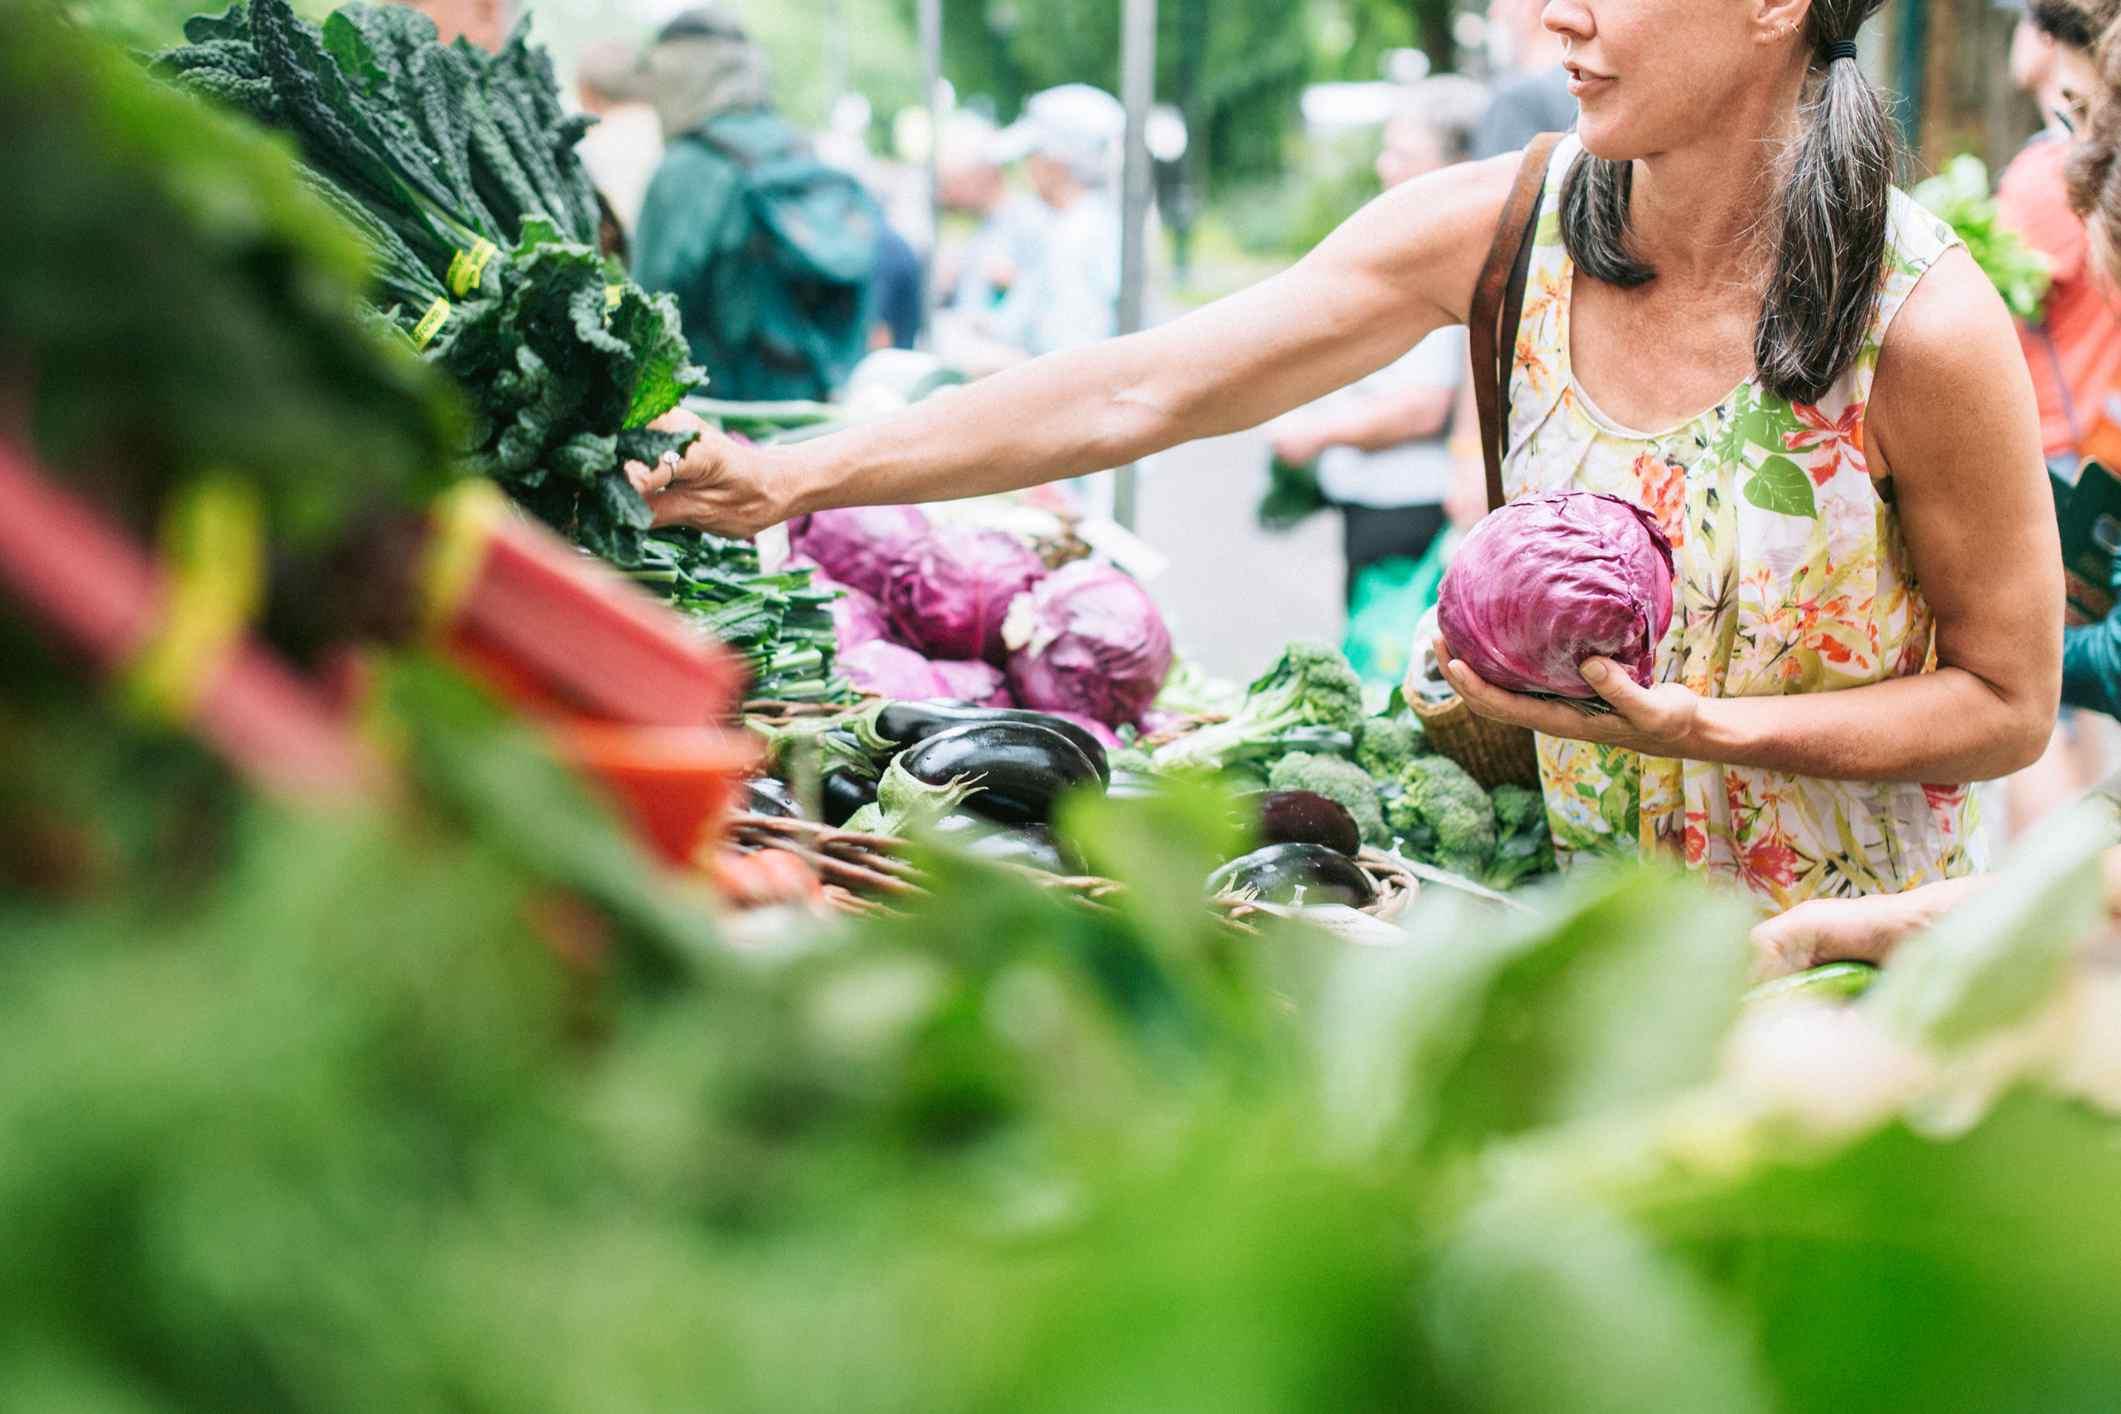 Farmers' market shopping